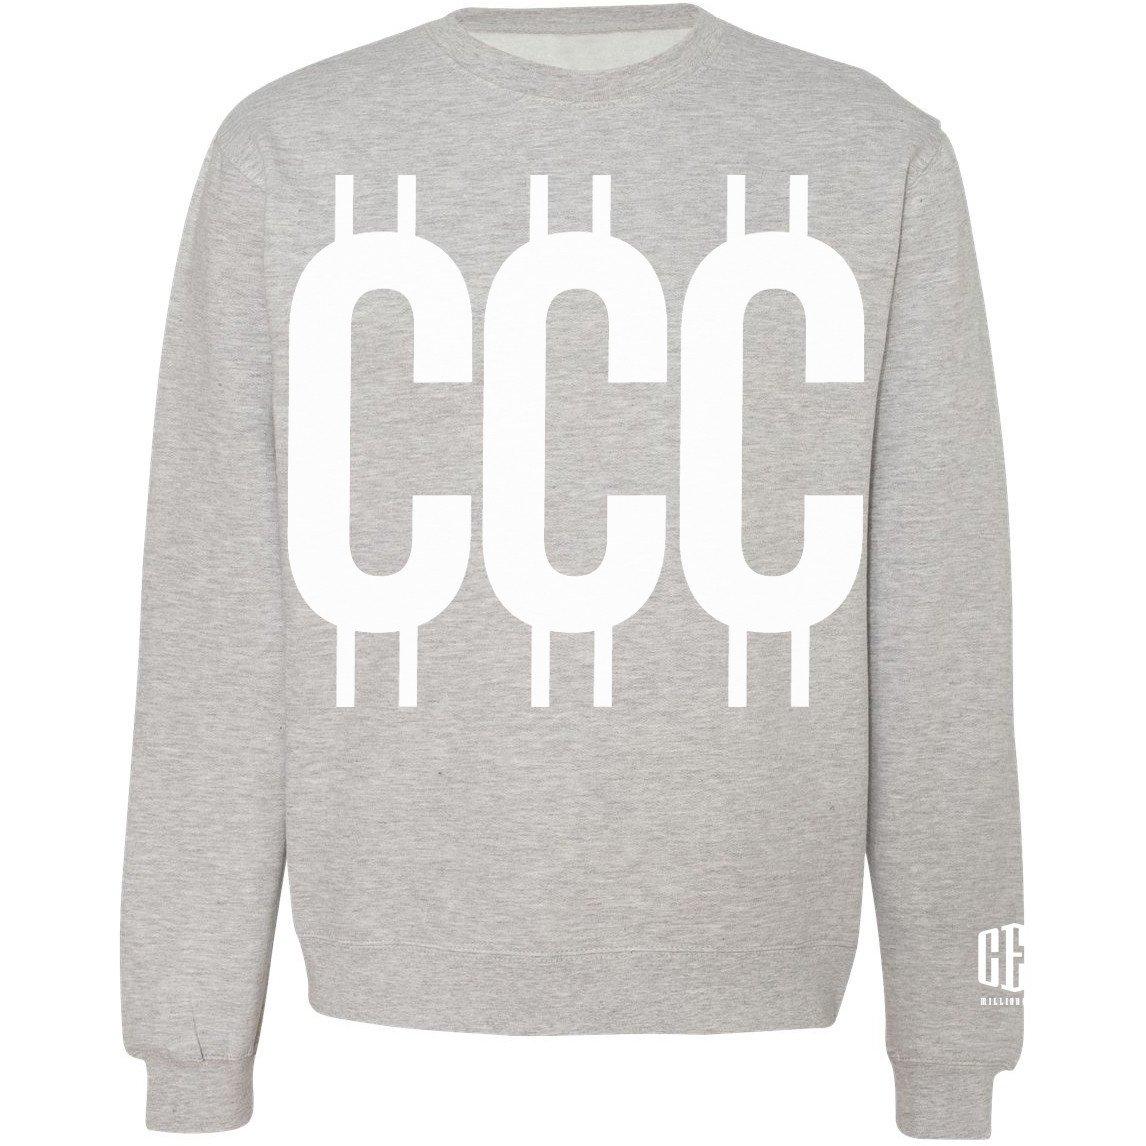 The Comma Comma Club Sweatshirt